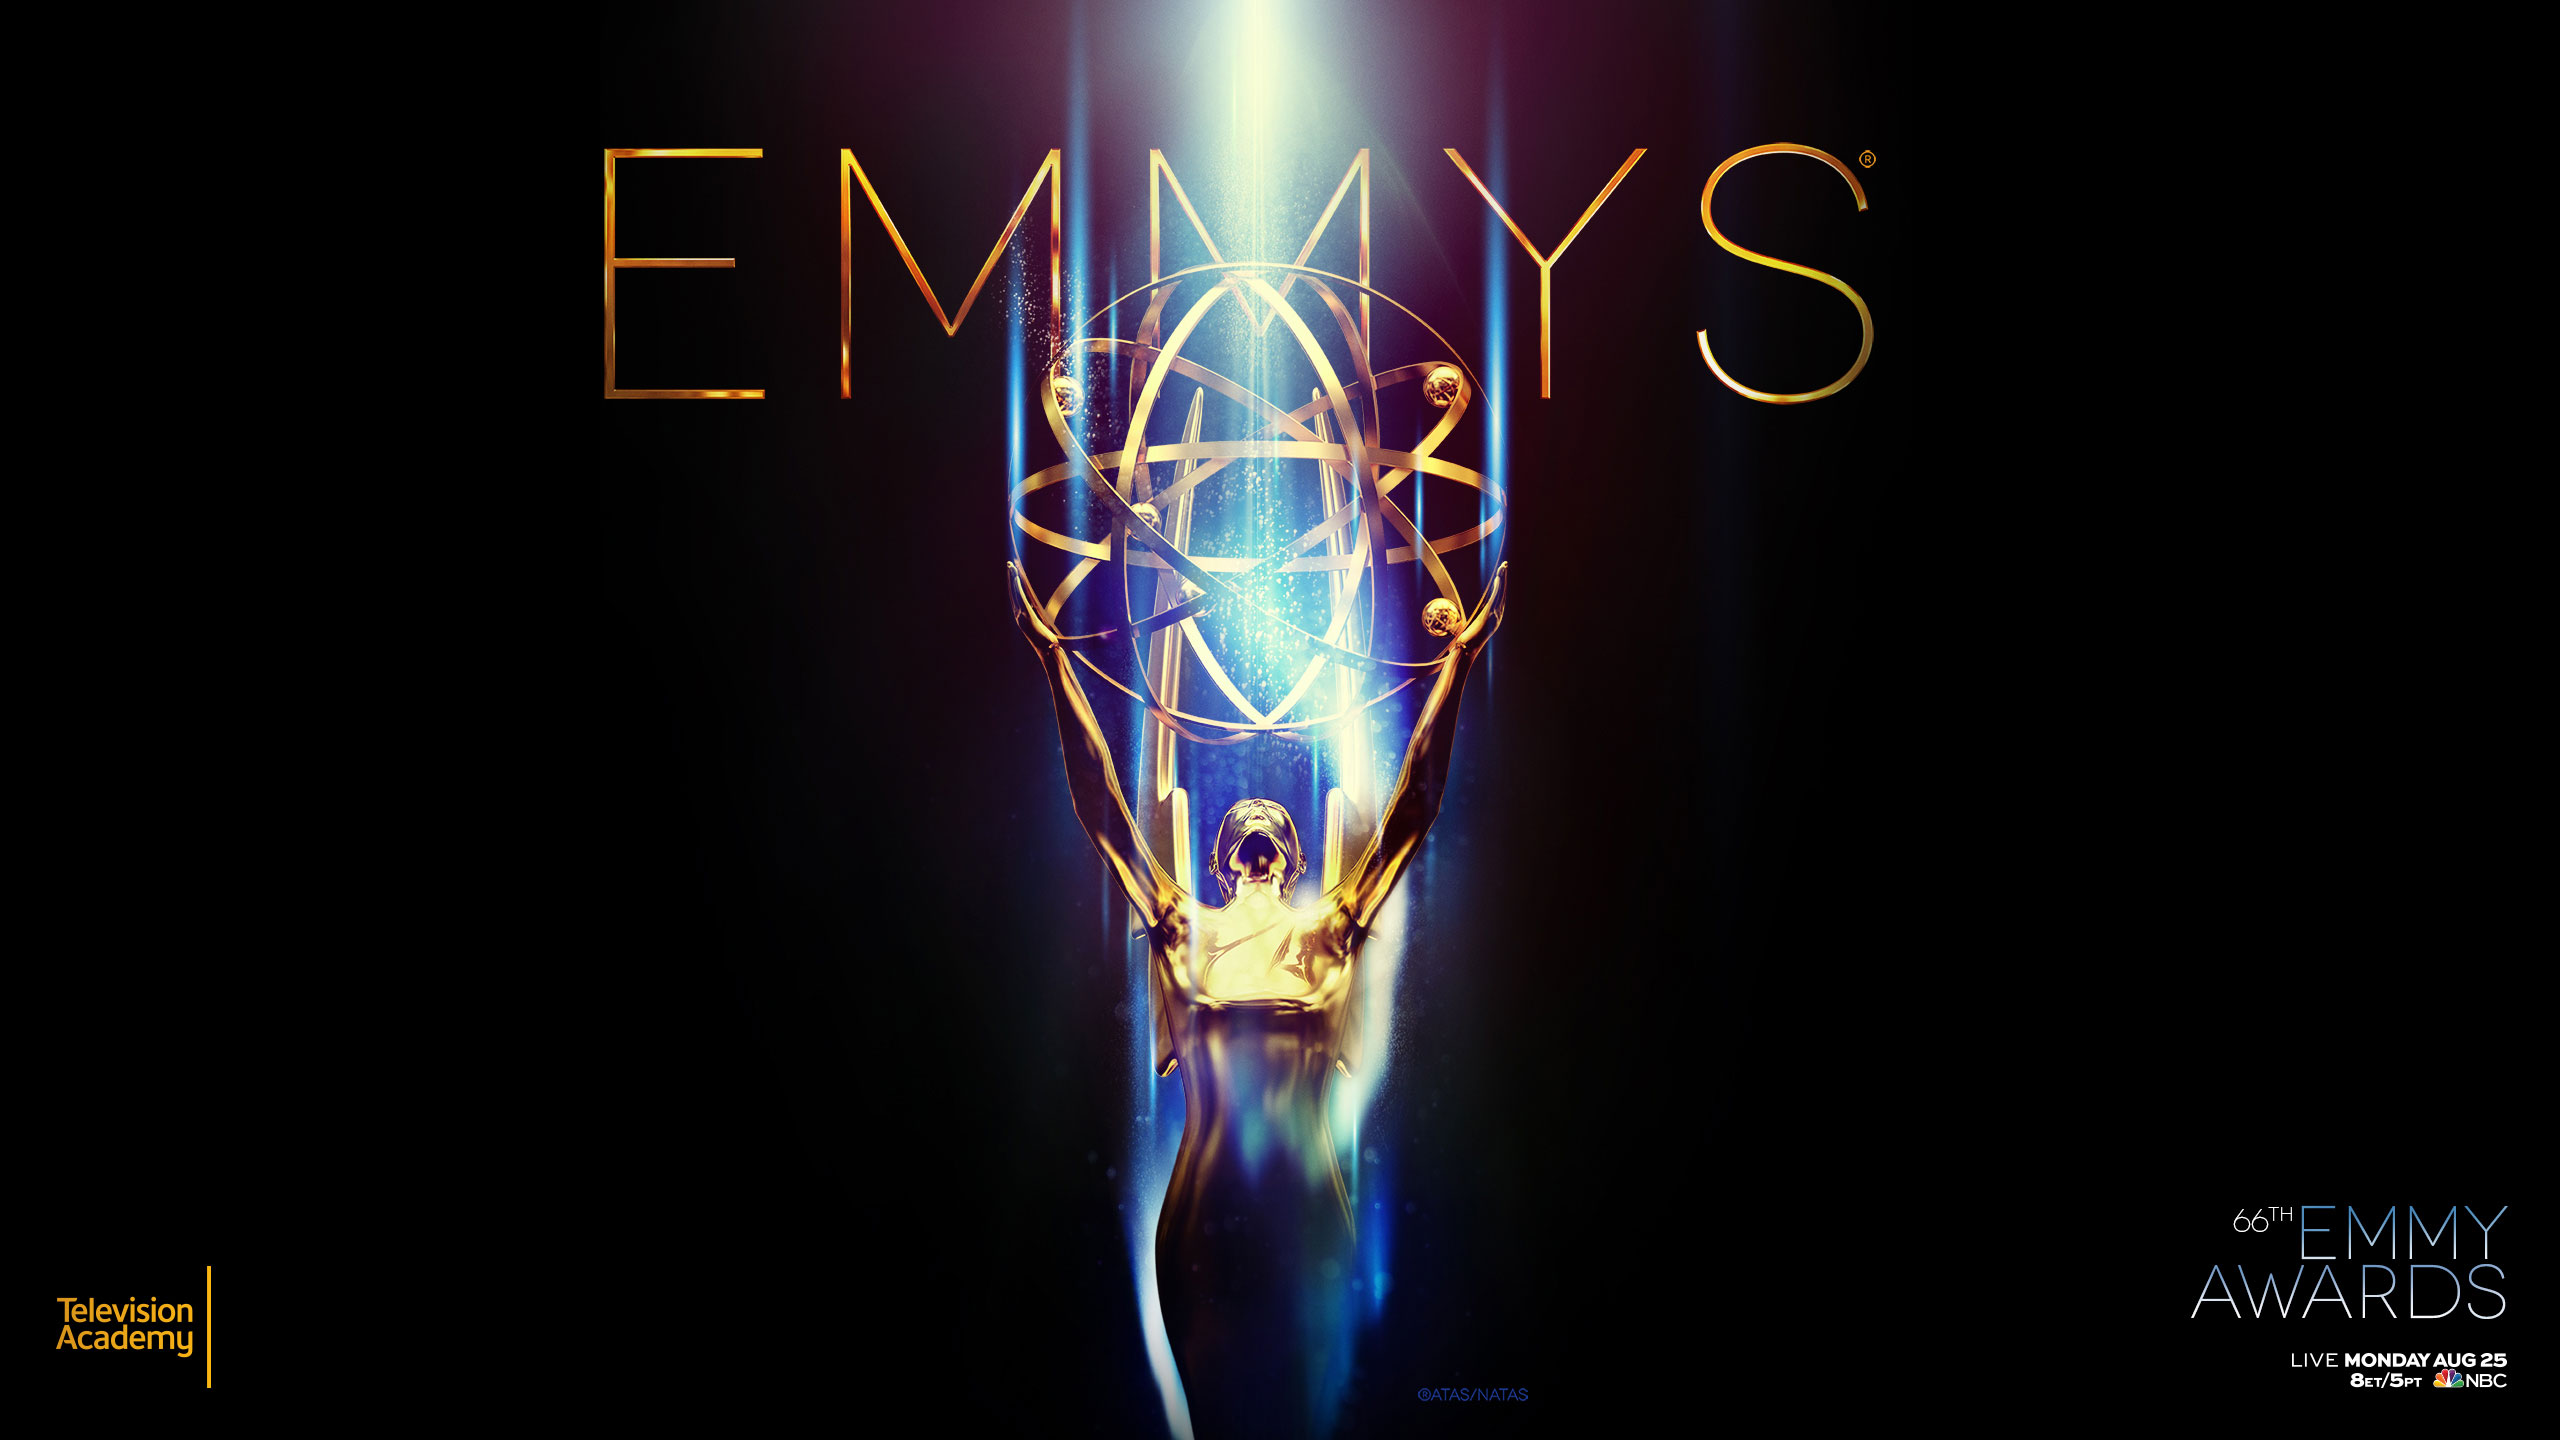 emmy-awards-logo